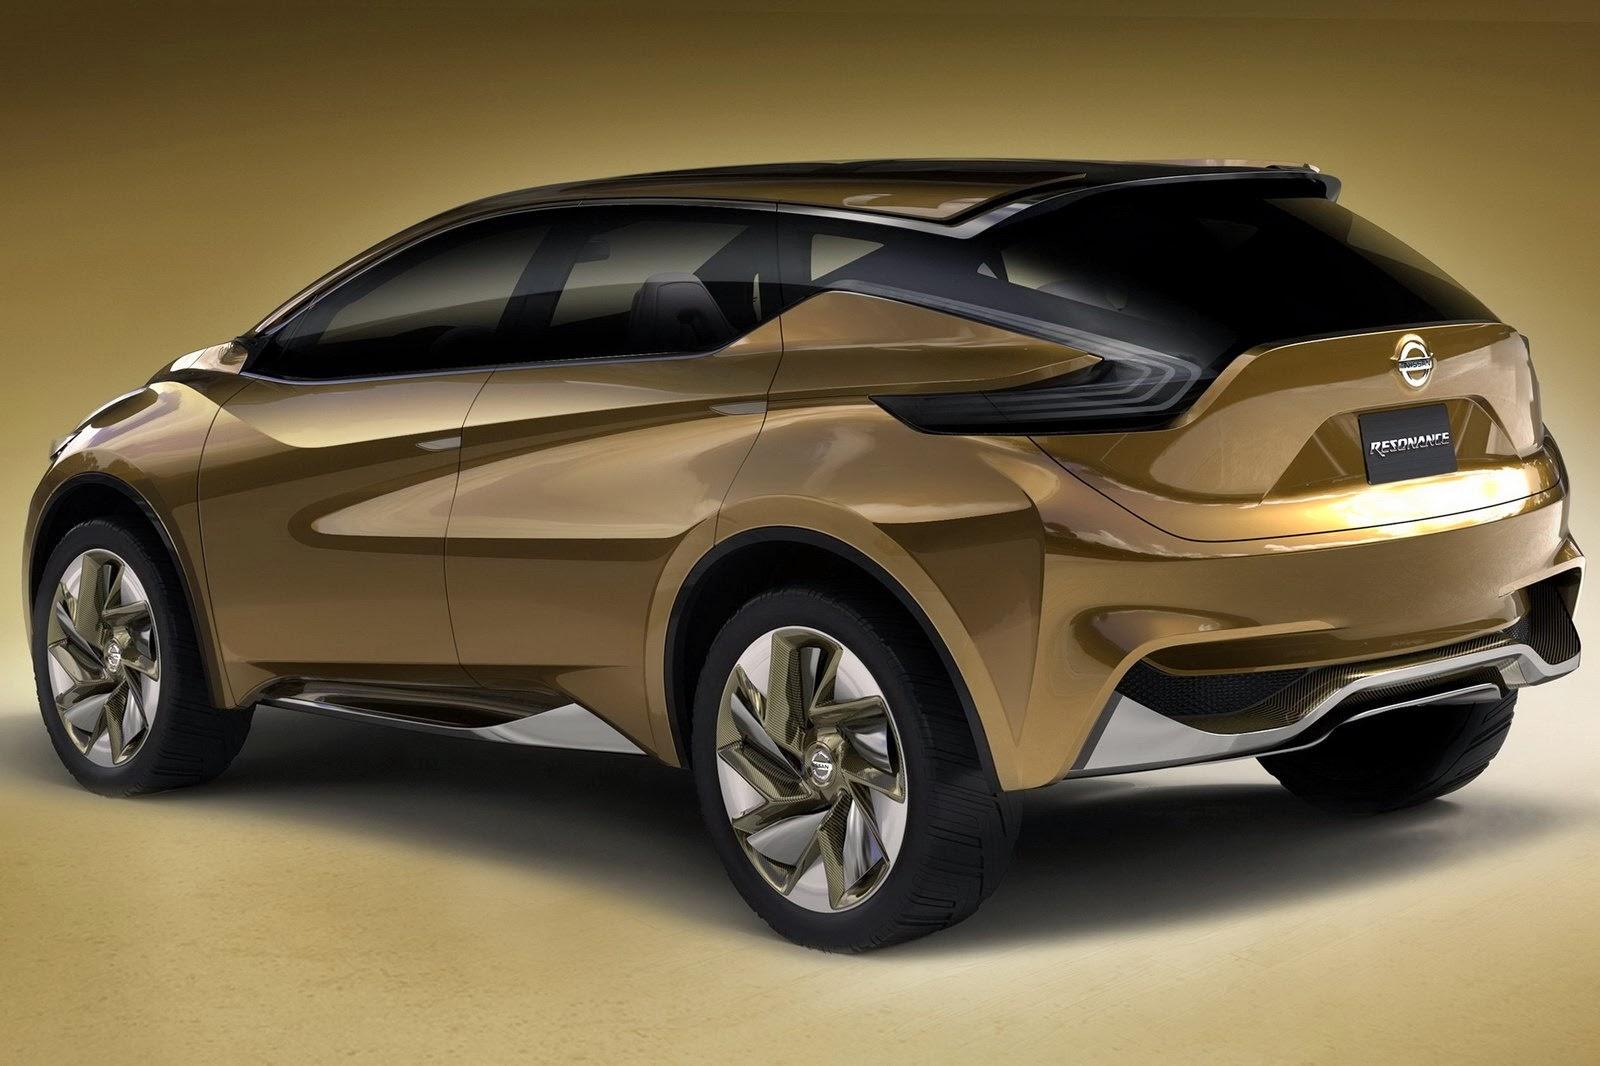 latest cars models 2015 nissan murano. Black Bedroom Furniture Sets. Home Design Ideas